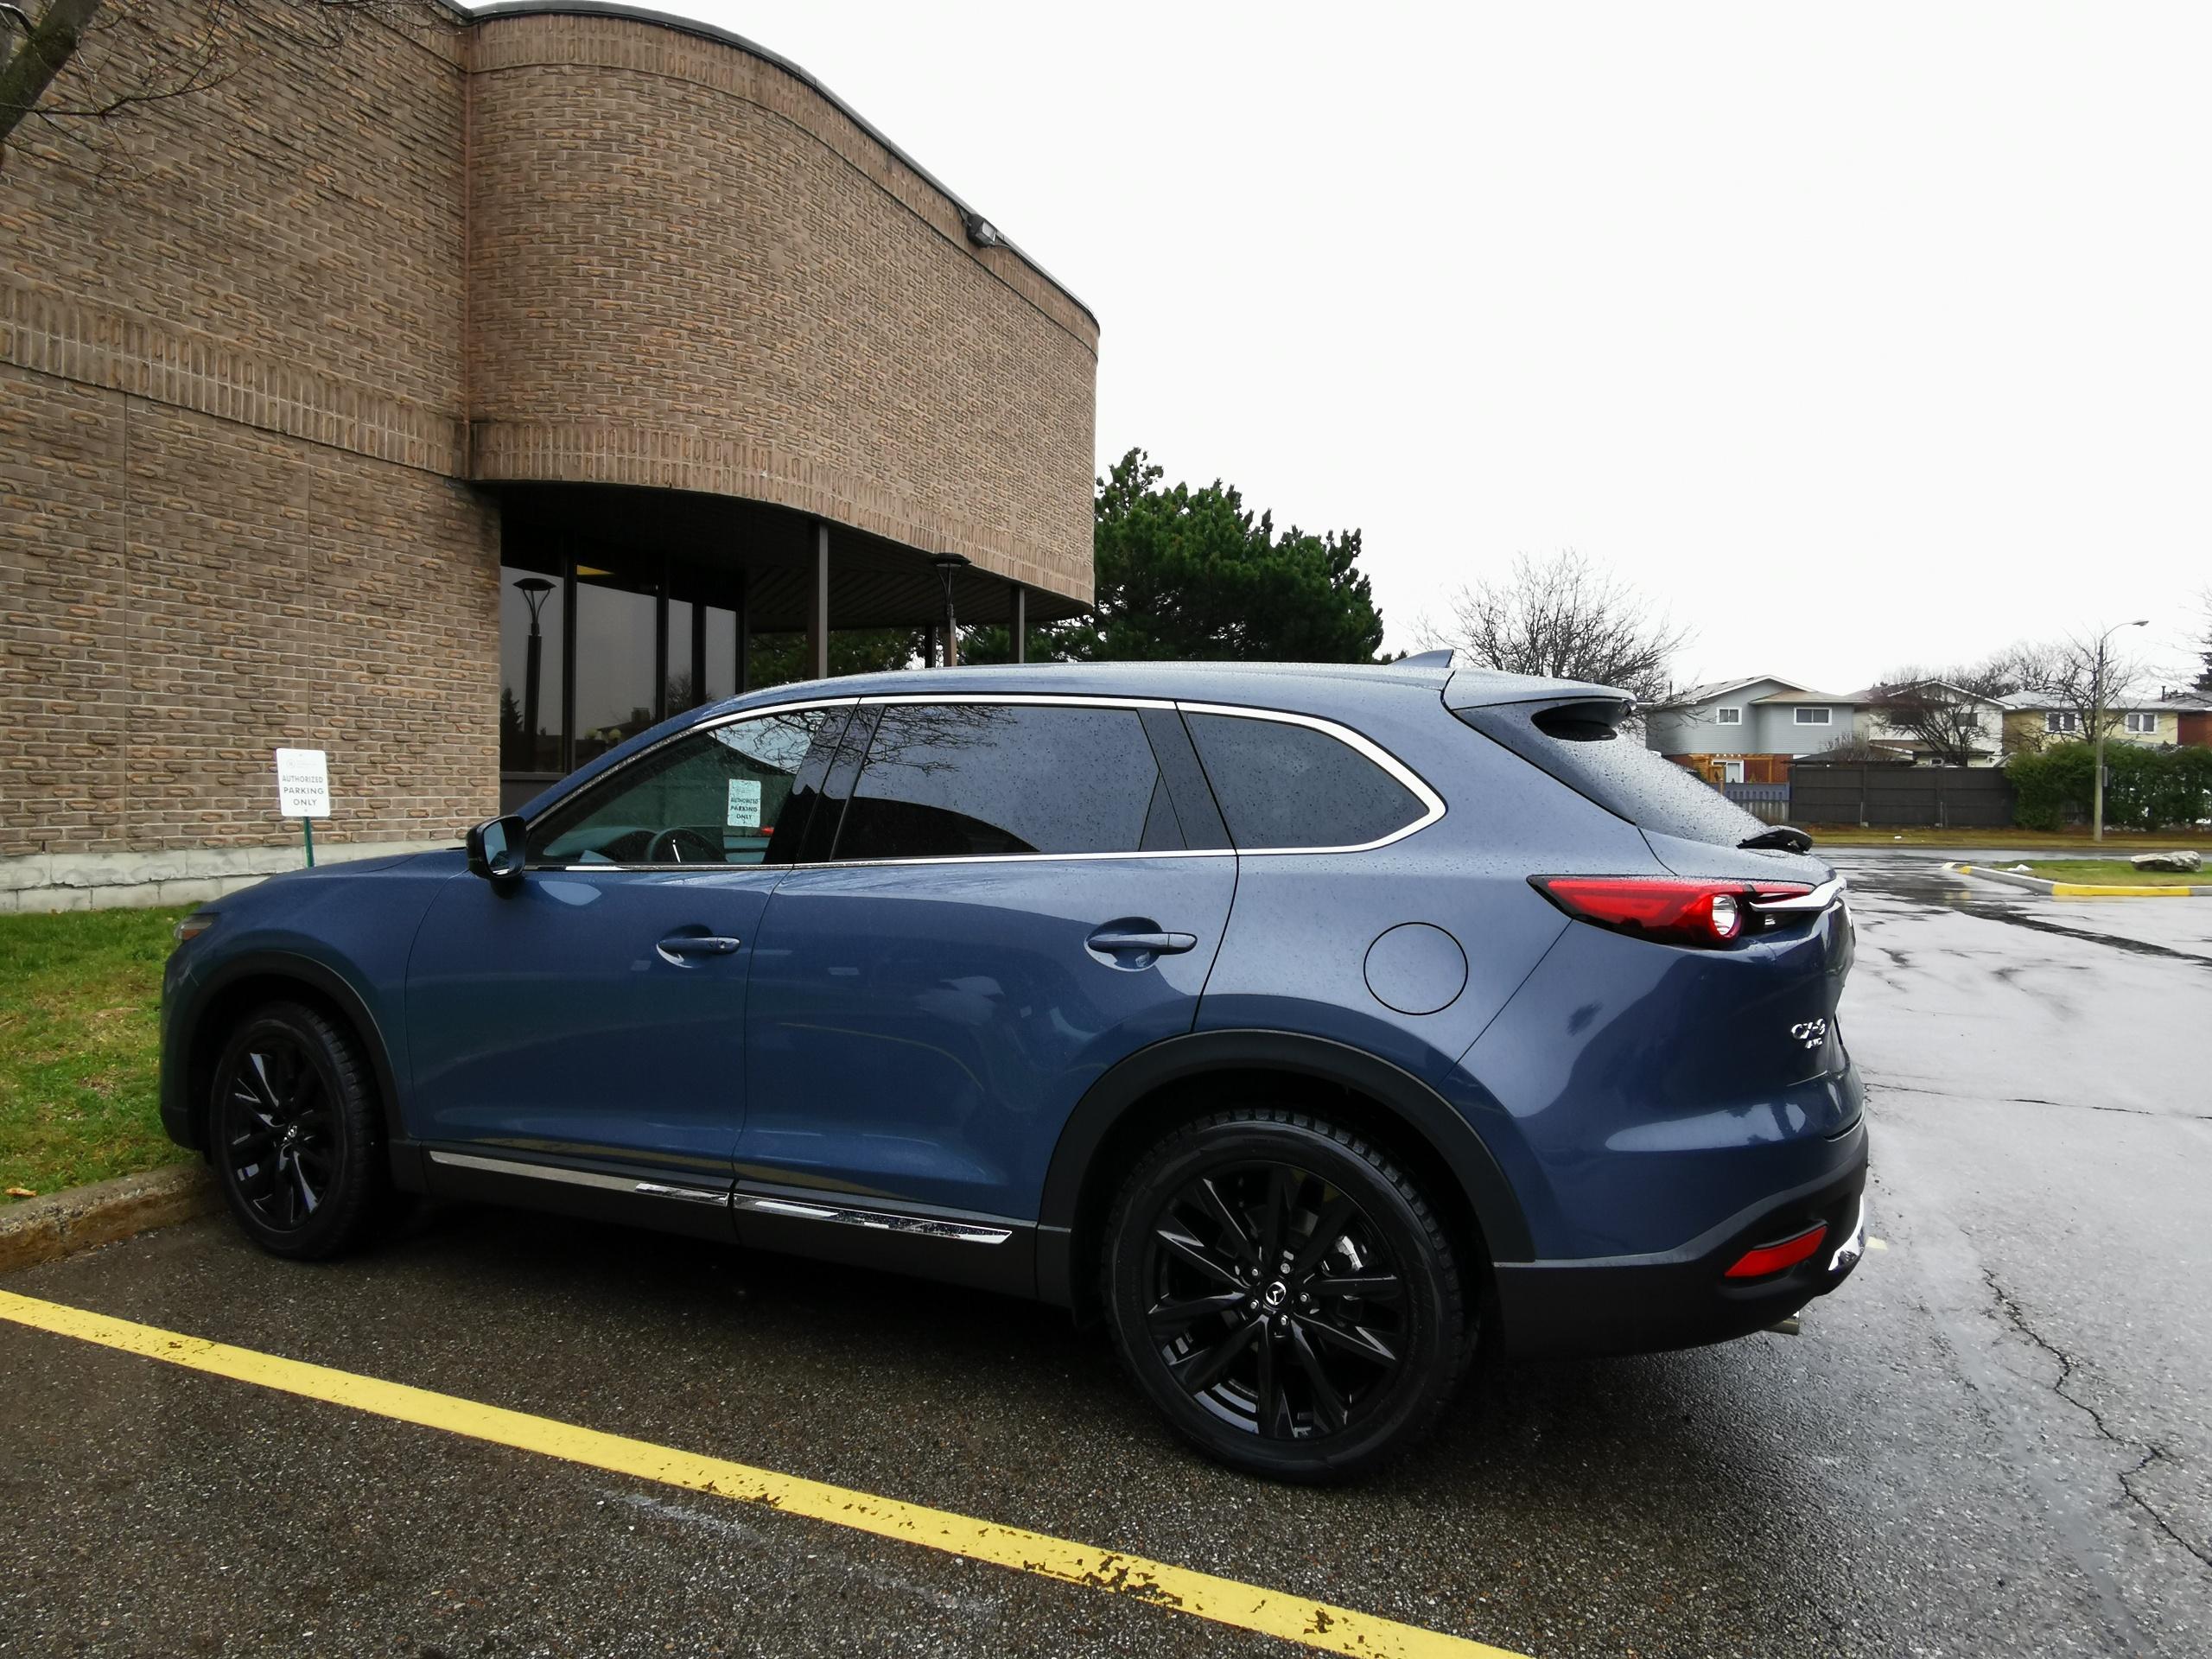 (Overall Product Review) 2021 Mazda CX-9 Kuro Edition 黒 – SUV AWD